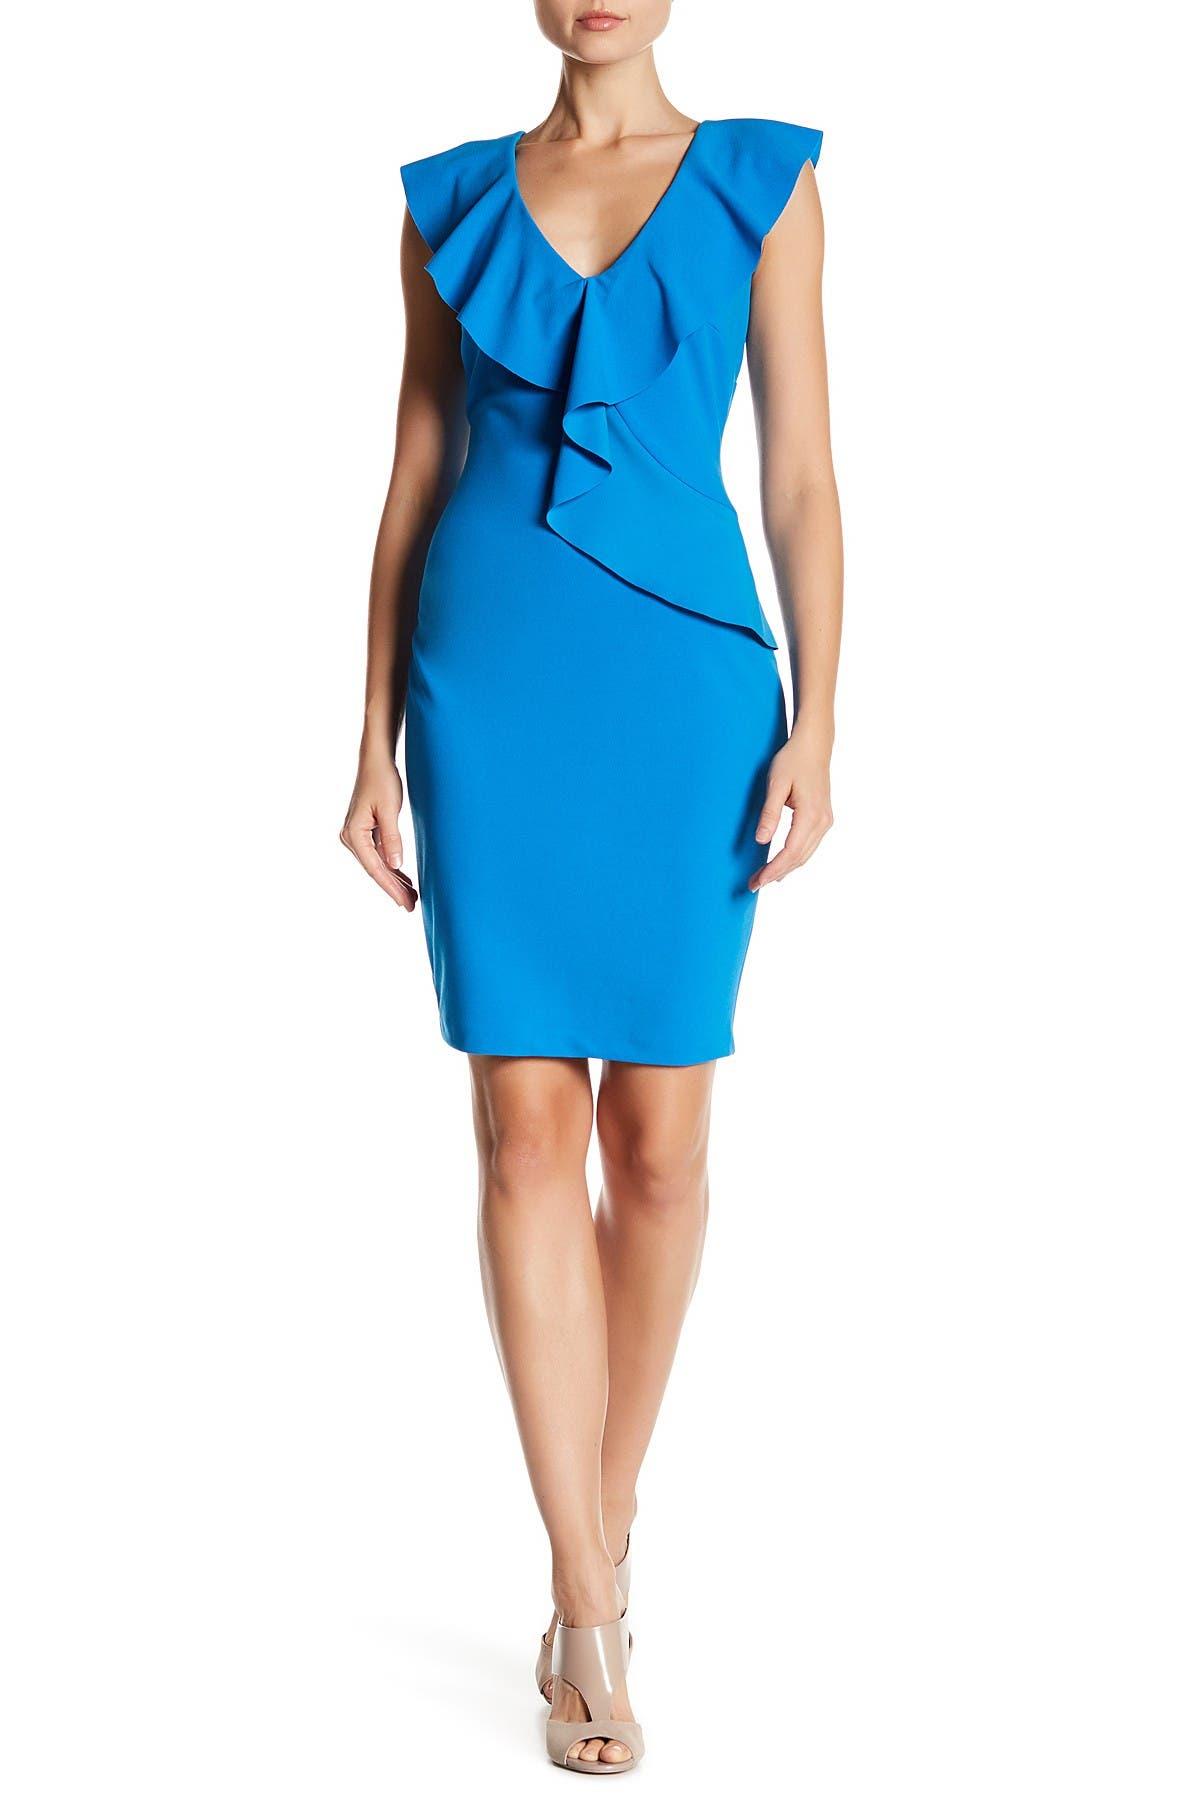 Image of Alexia Admor Asymmetric Ruffle Sheath Dress